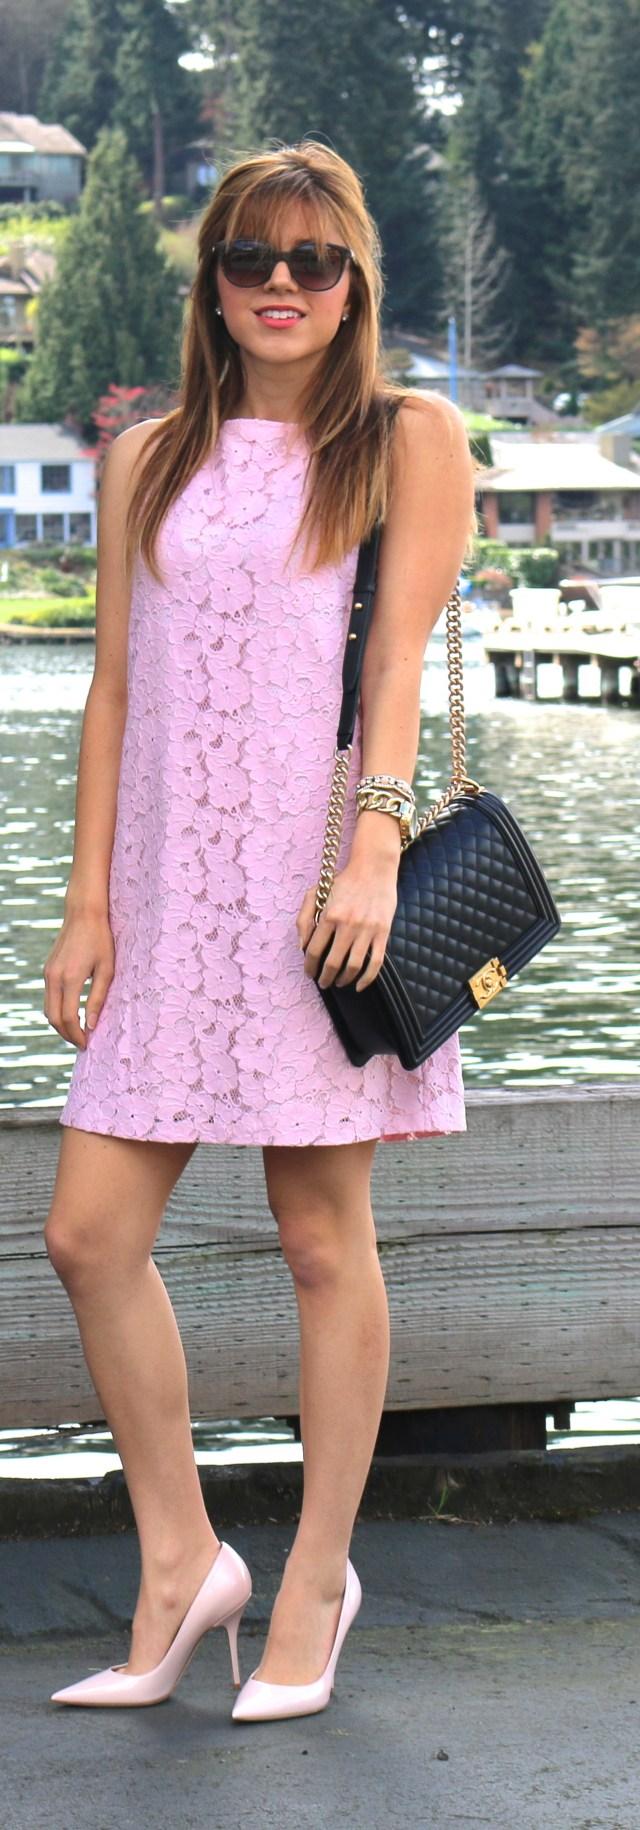 BB-Dakota-Savannah-Lace-Shift-Dress, Nordstrom, Chanel-Boy-Bag, Dior-Pink-Shoes